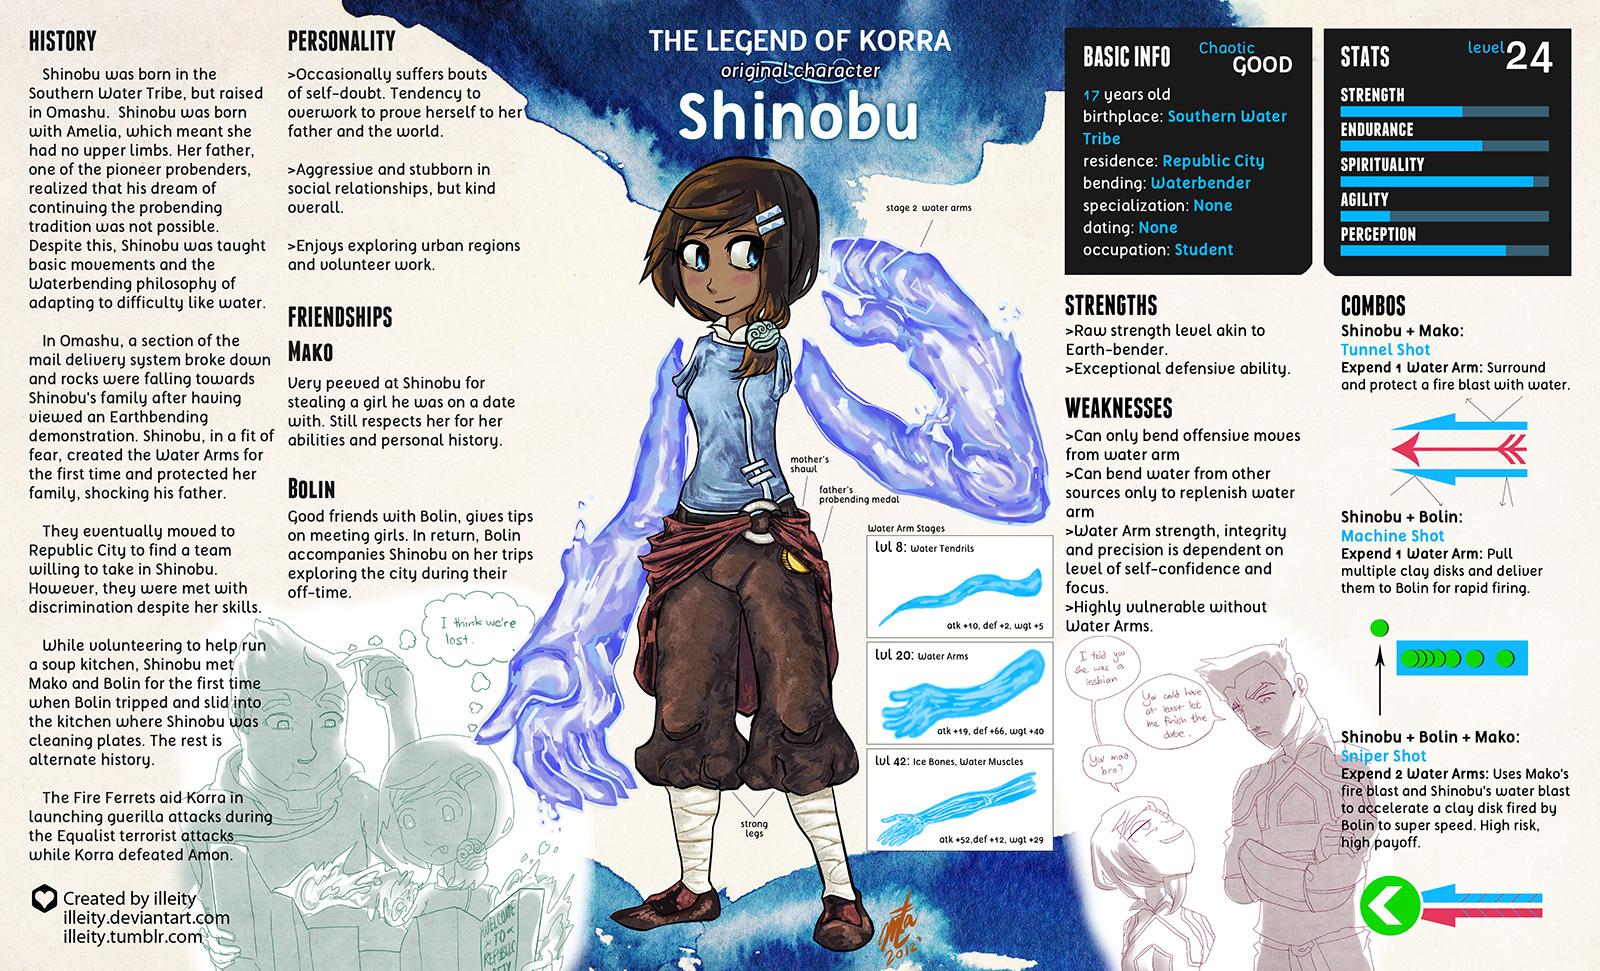 Shinobu: The Armless Waterbender by illeity